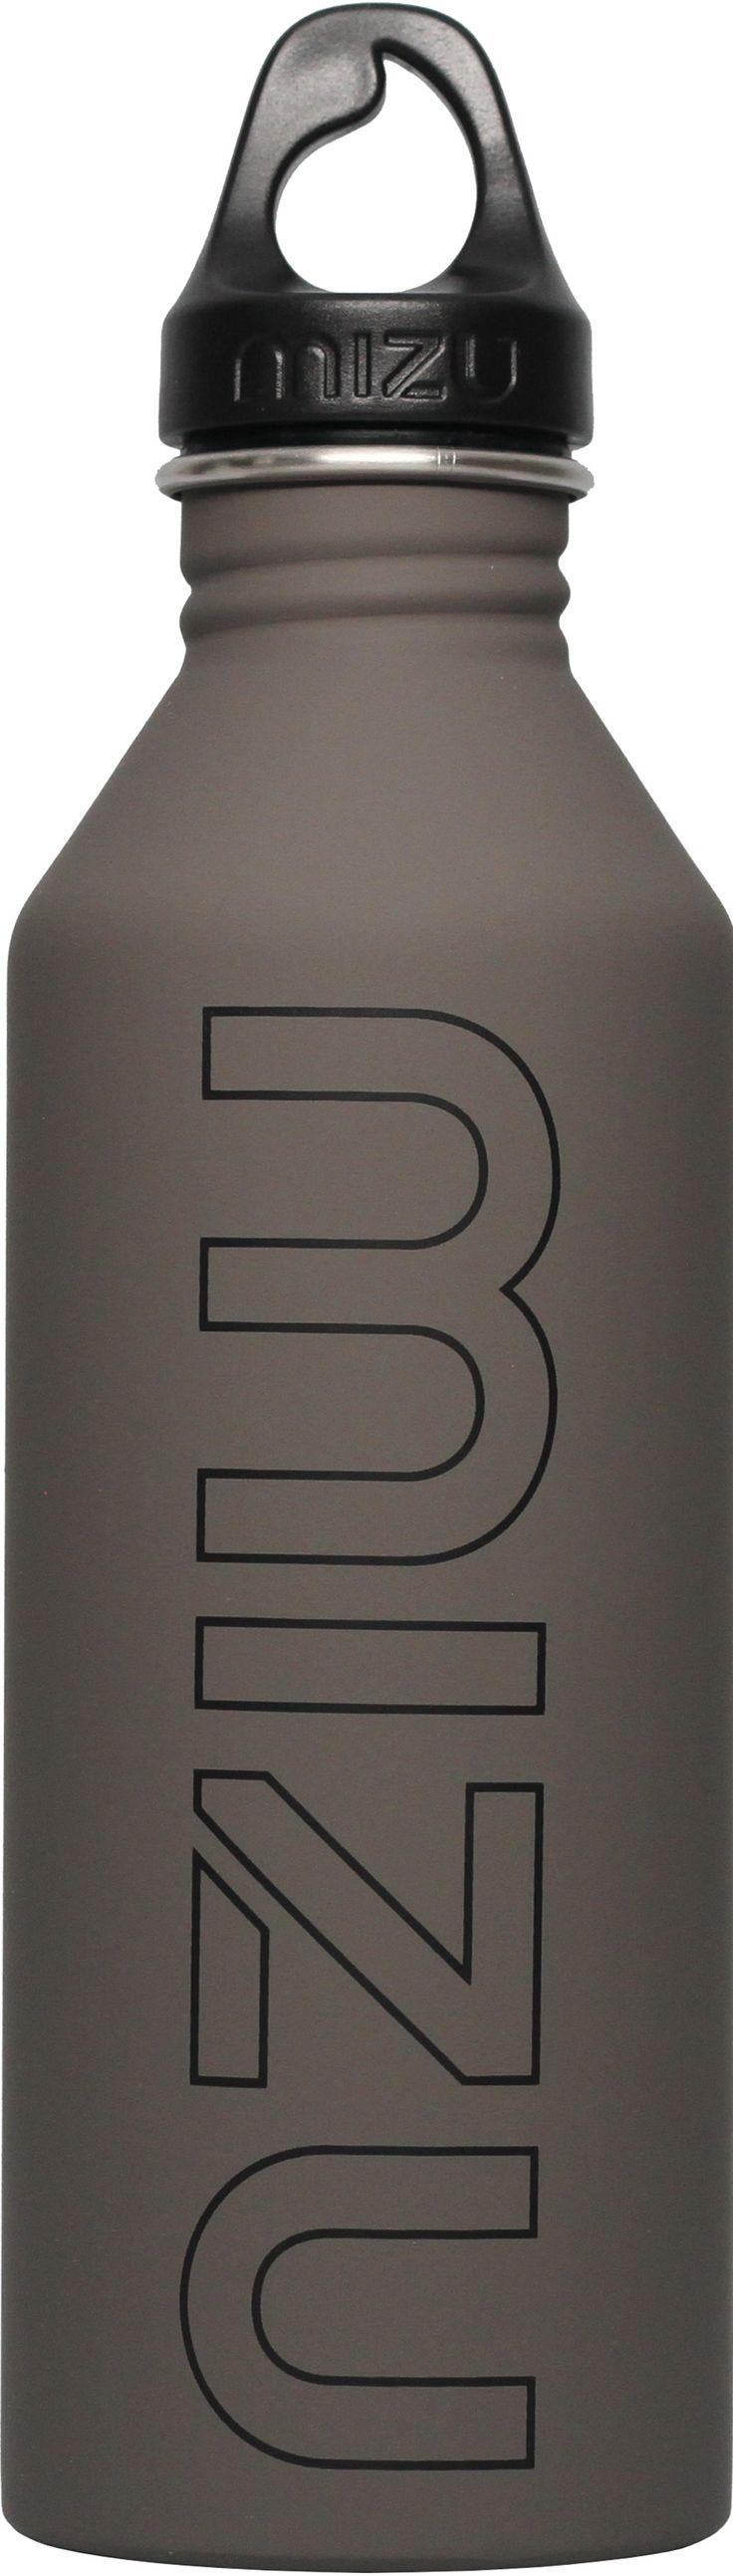 Mizu bottle gray